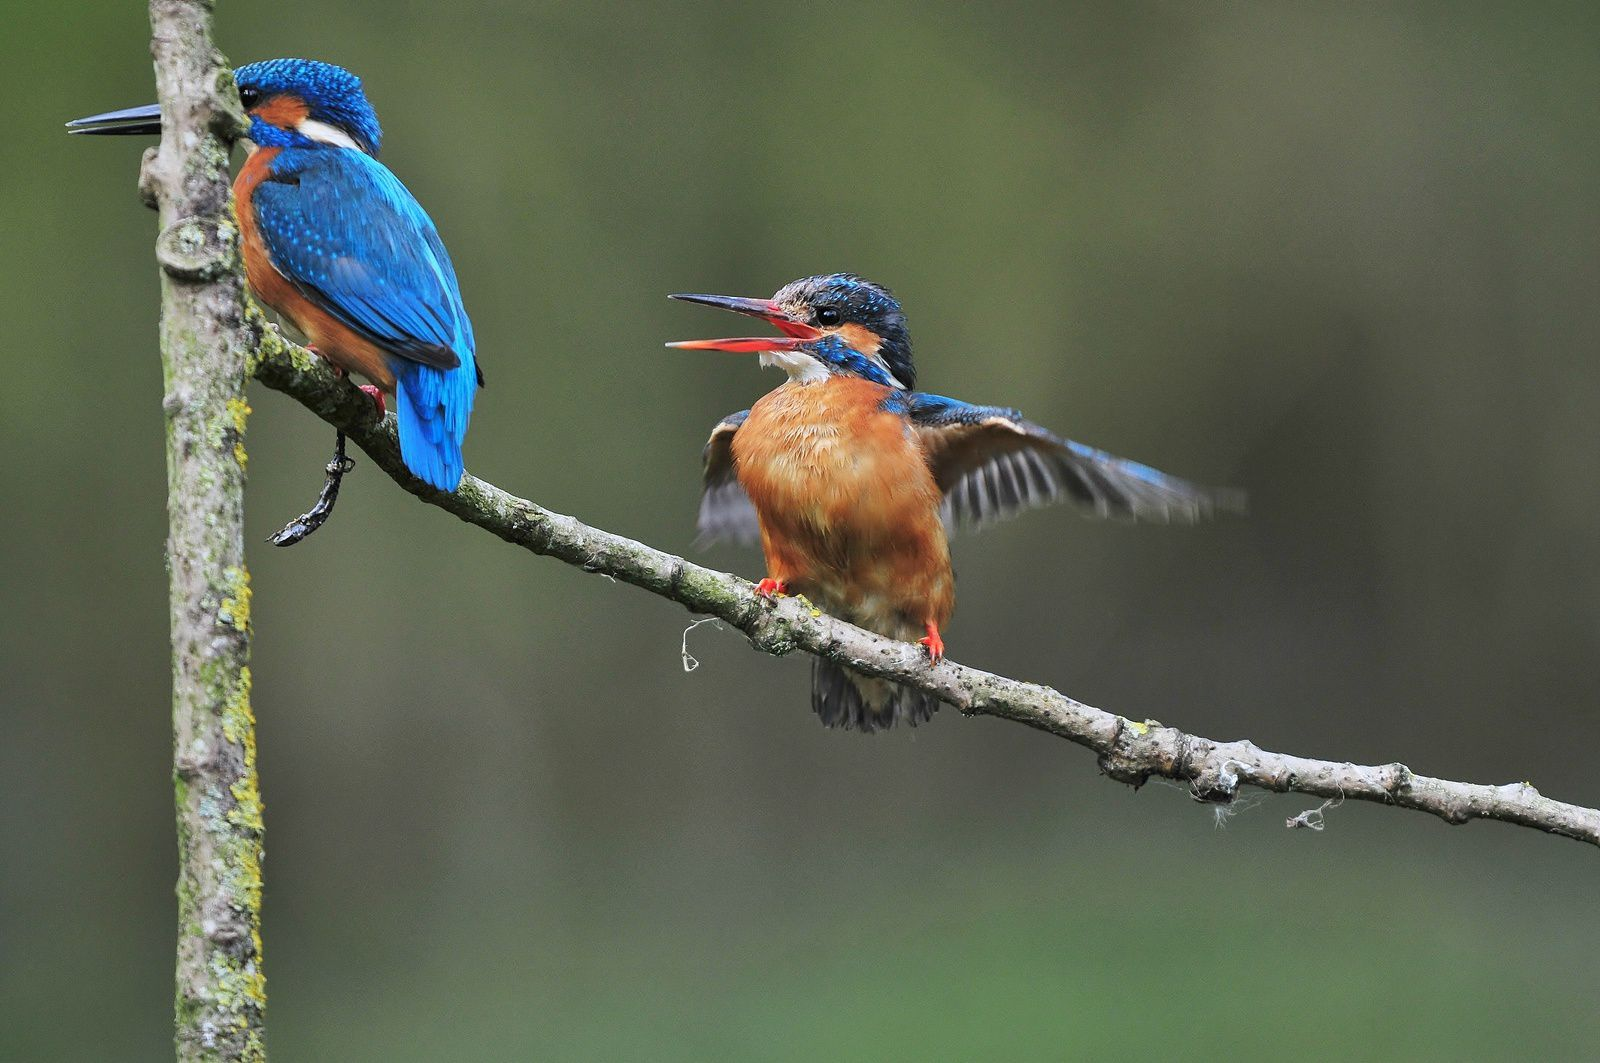 Martins pêcheurs d'Europe (mâle et femelle).